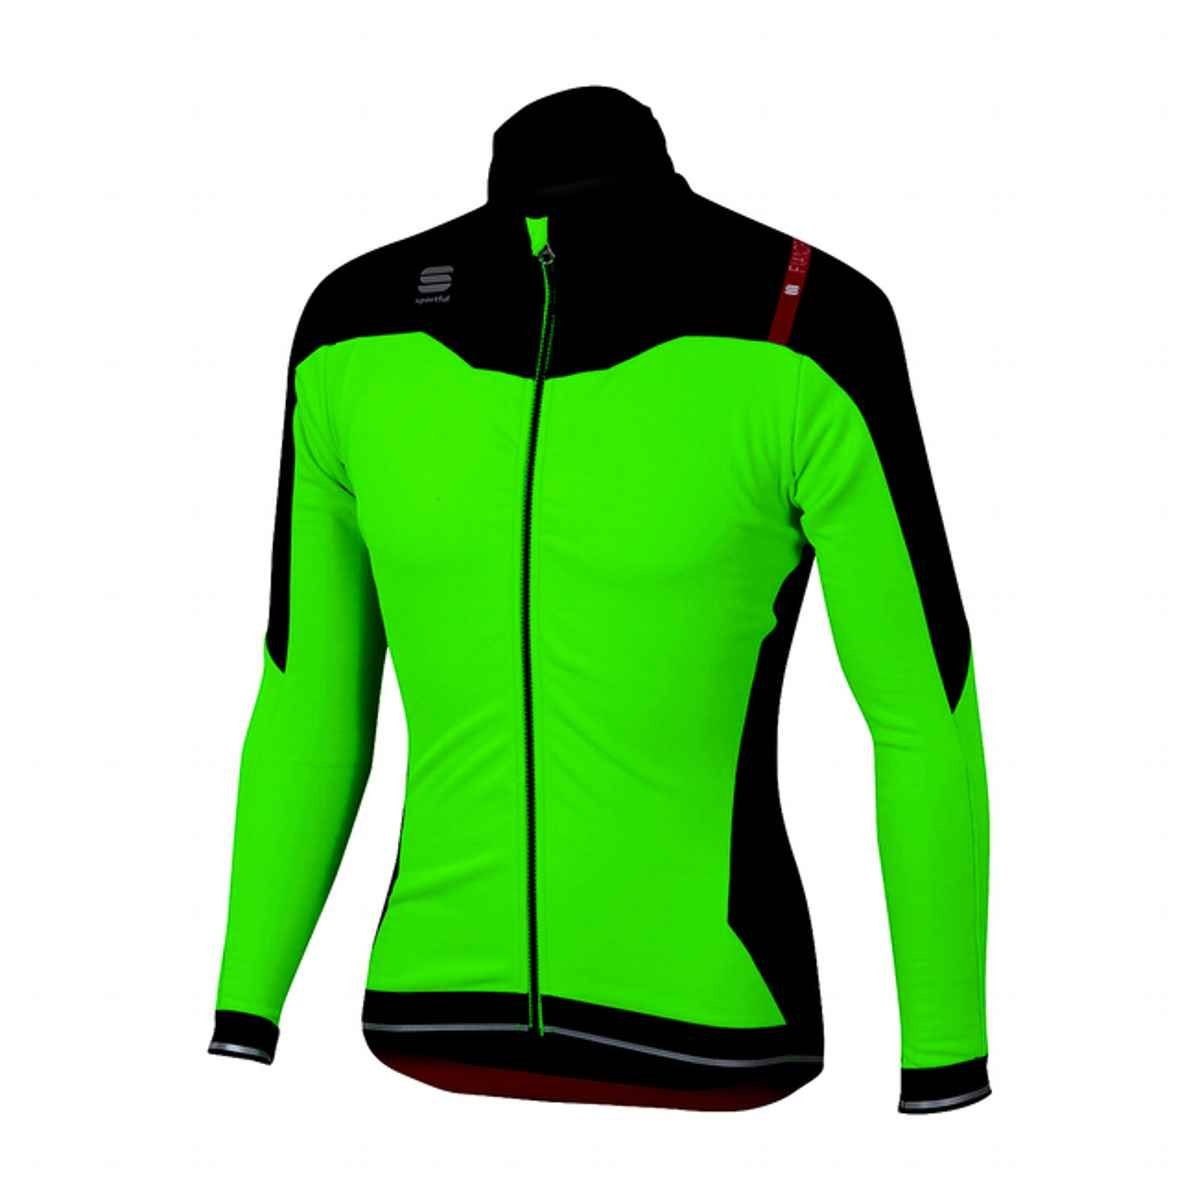 51TKAwOwvxL. SL1200  - Chubasqueros y Chaquetas Impermeables de Ciclismo para Hombre